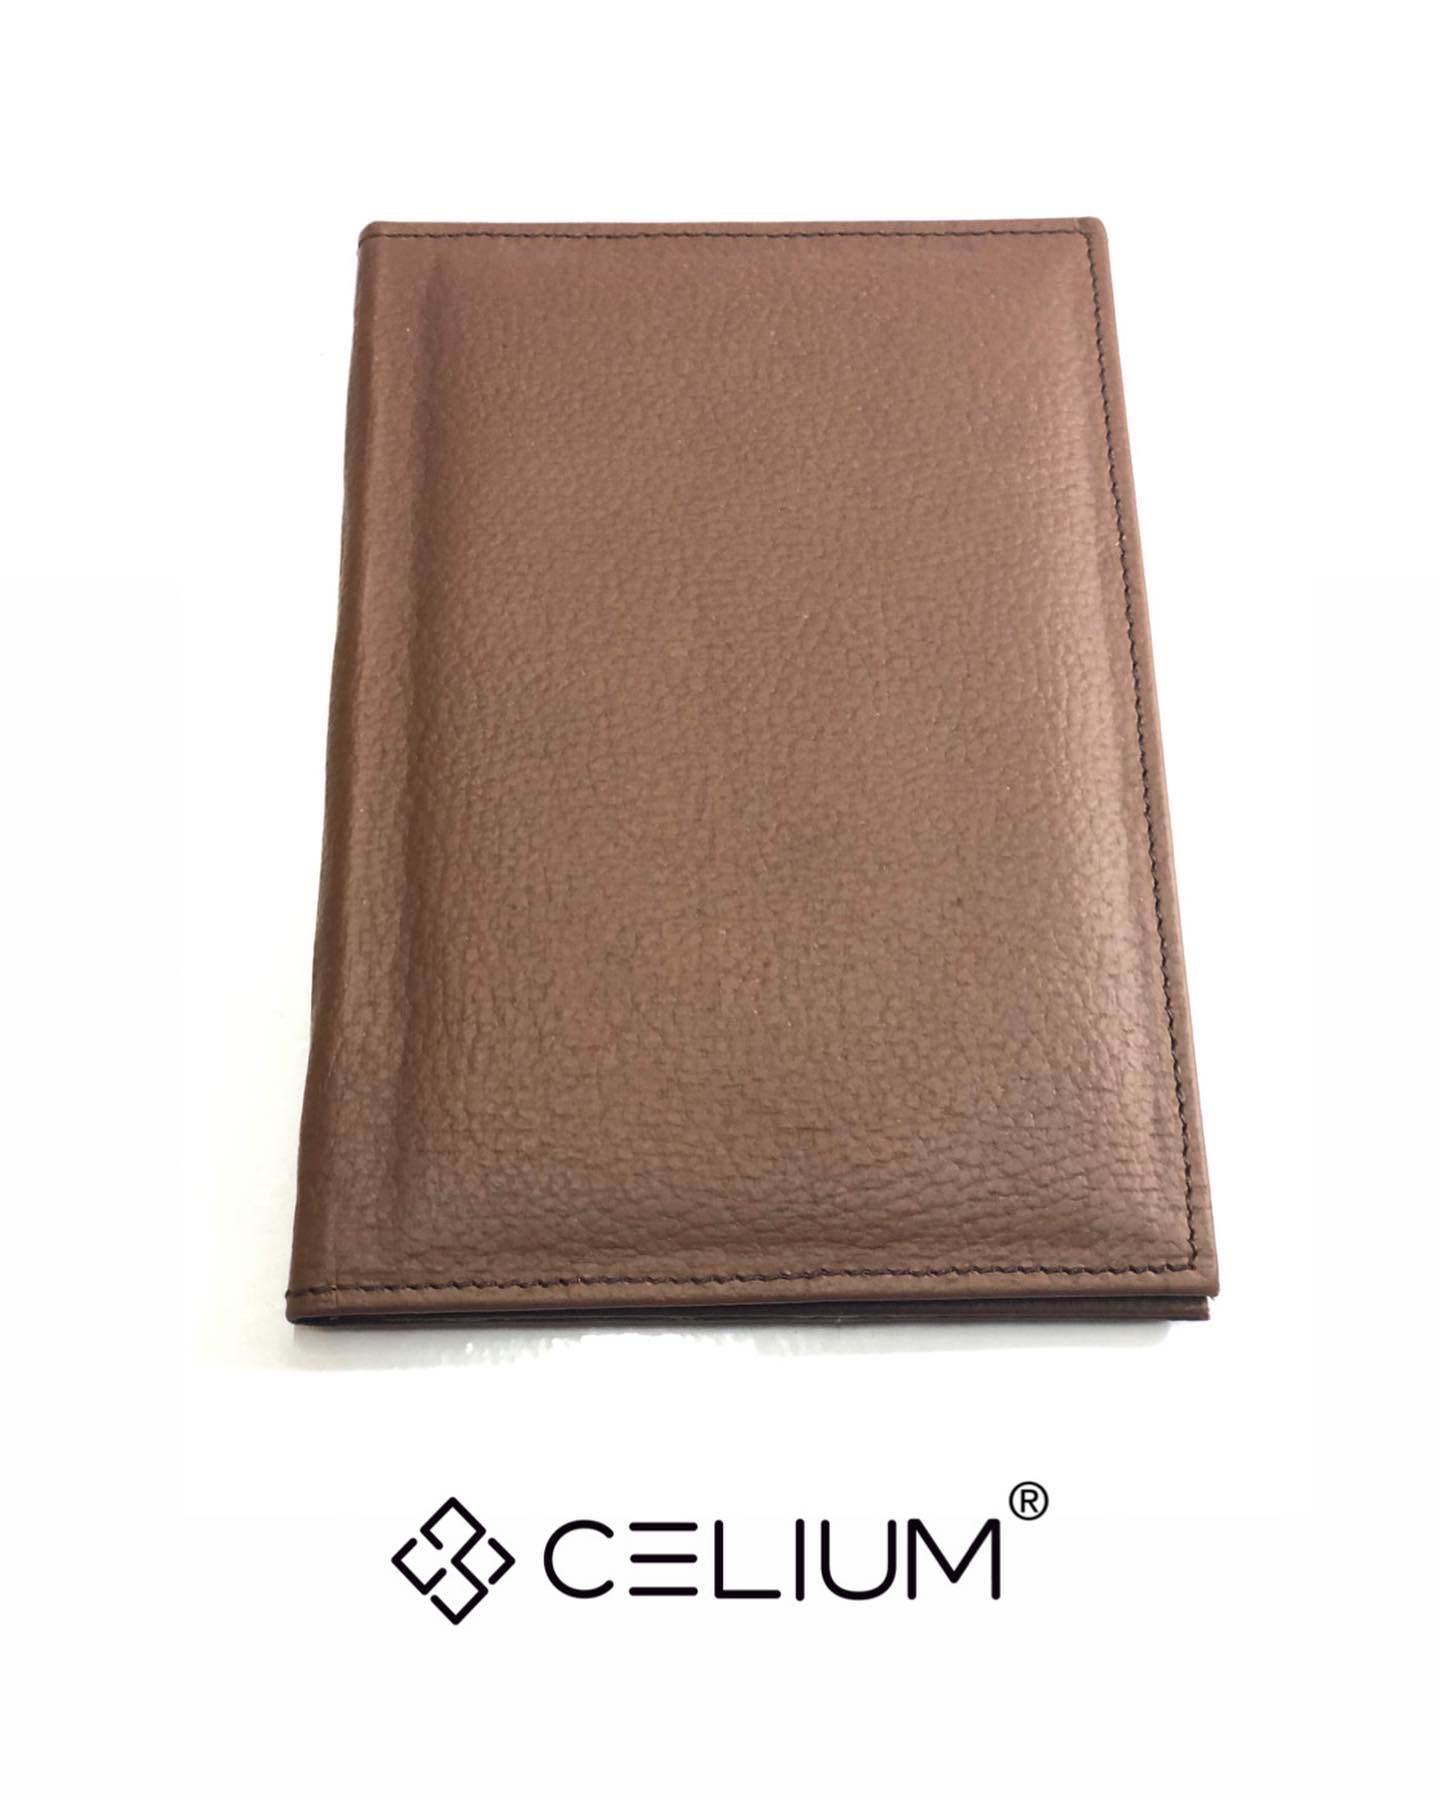 Gallery Celium® BioFabricated Leather 3